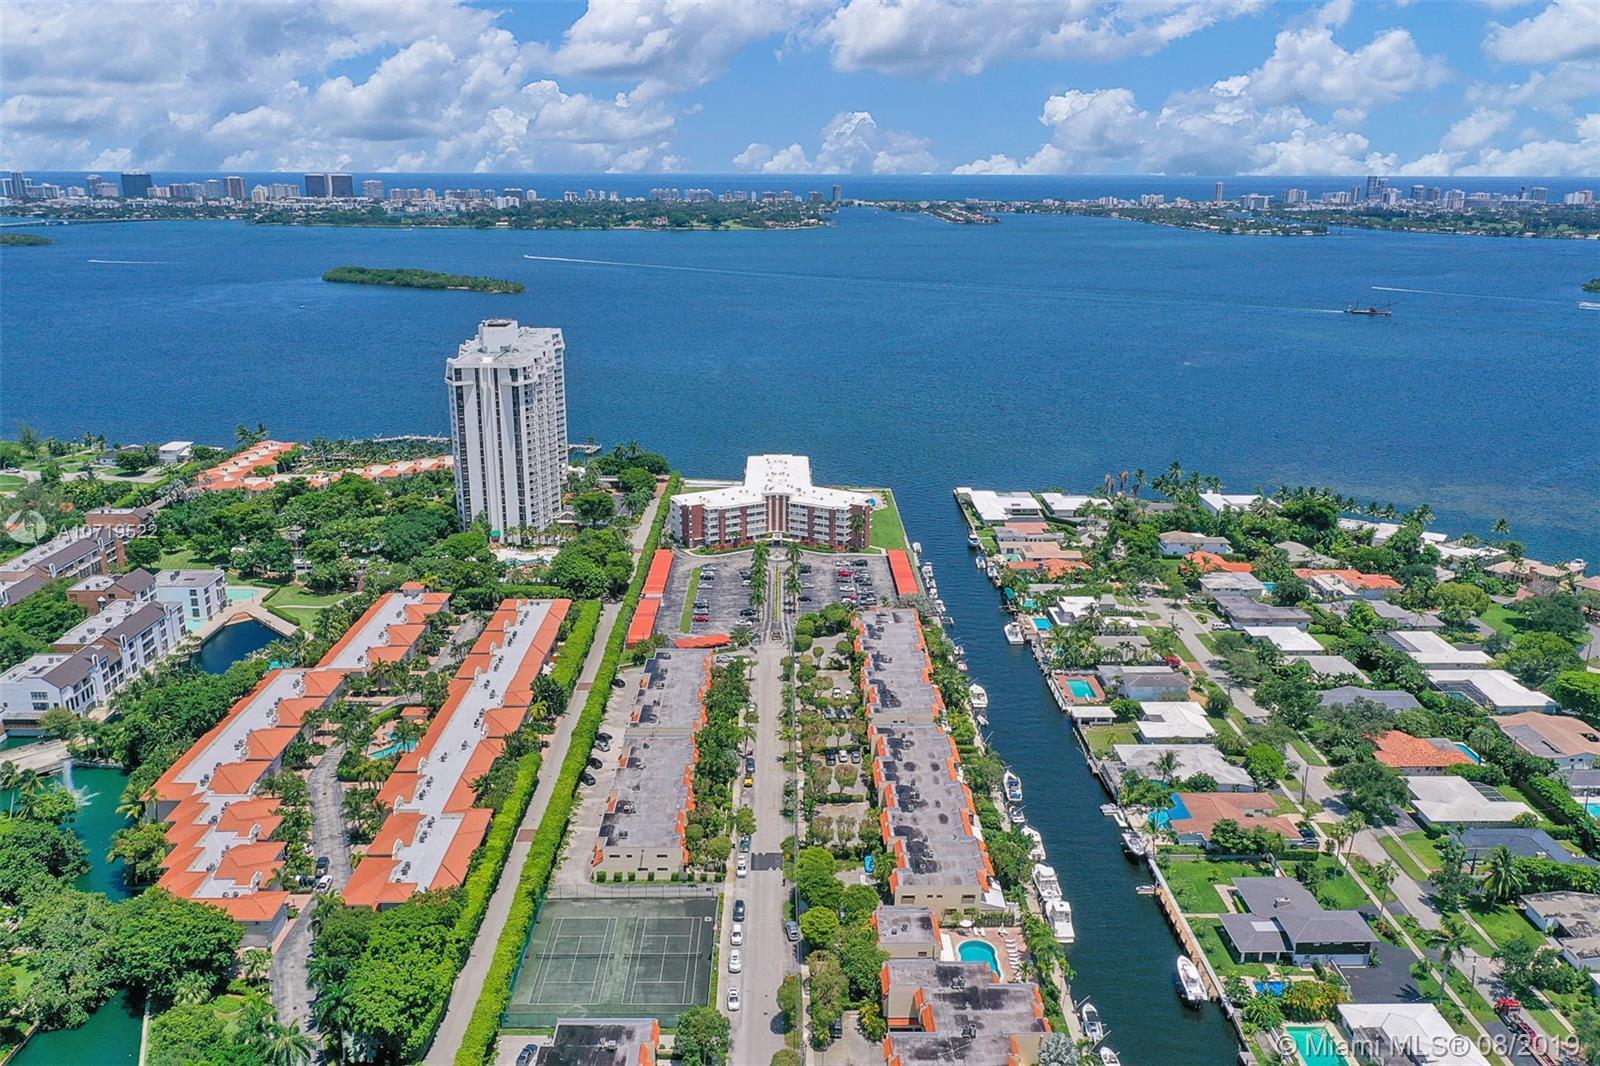 Miami Shores #B-12 - 41 - photo